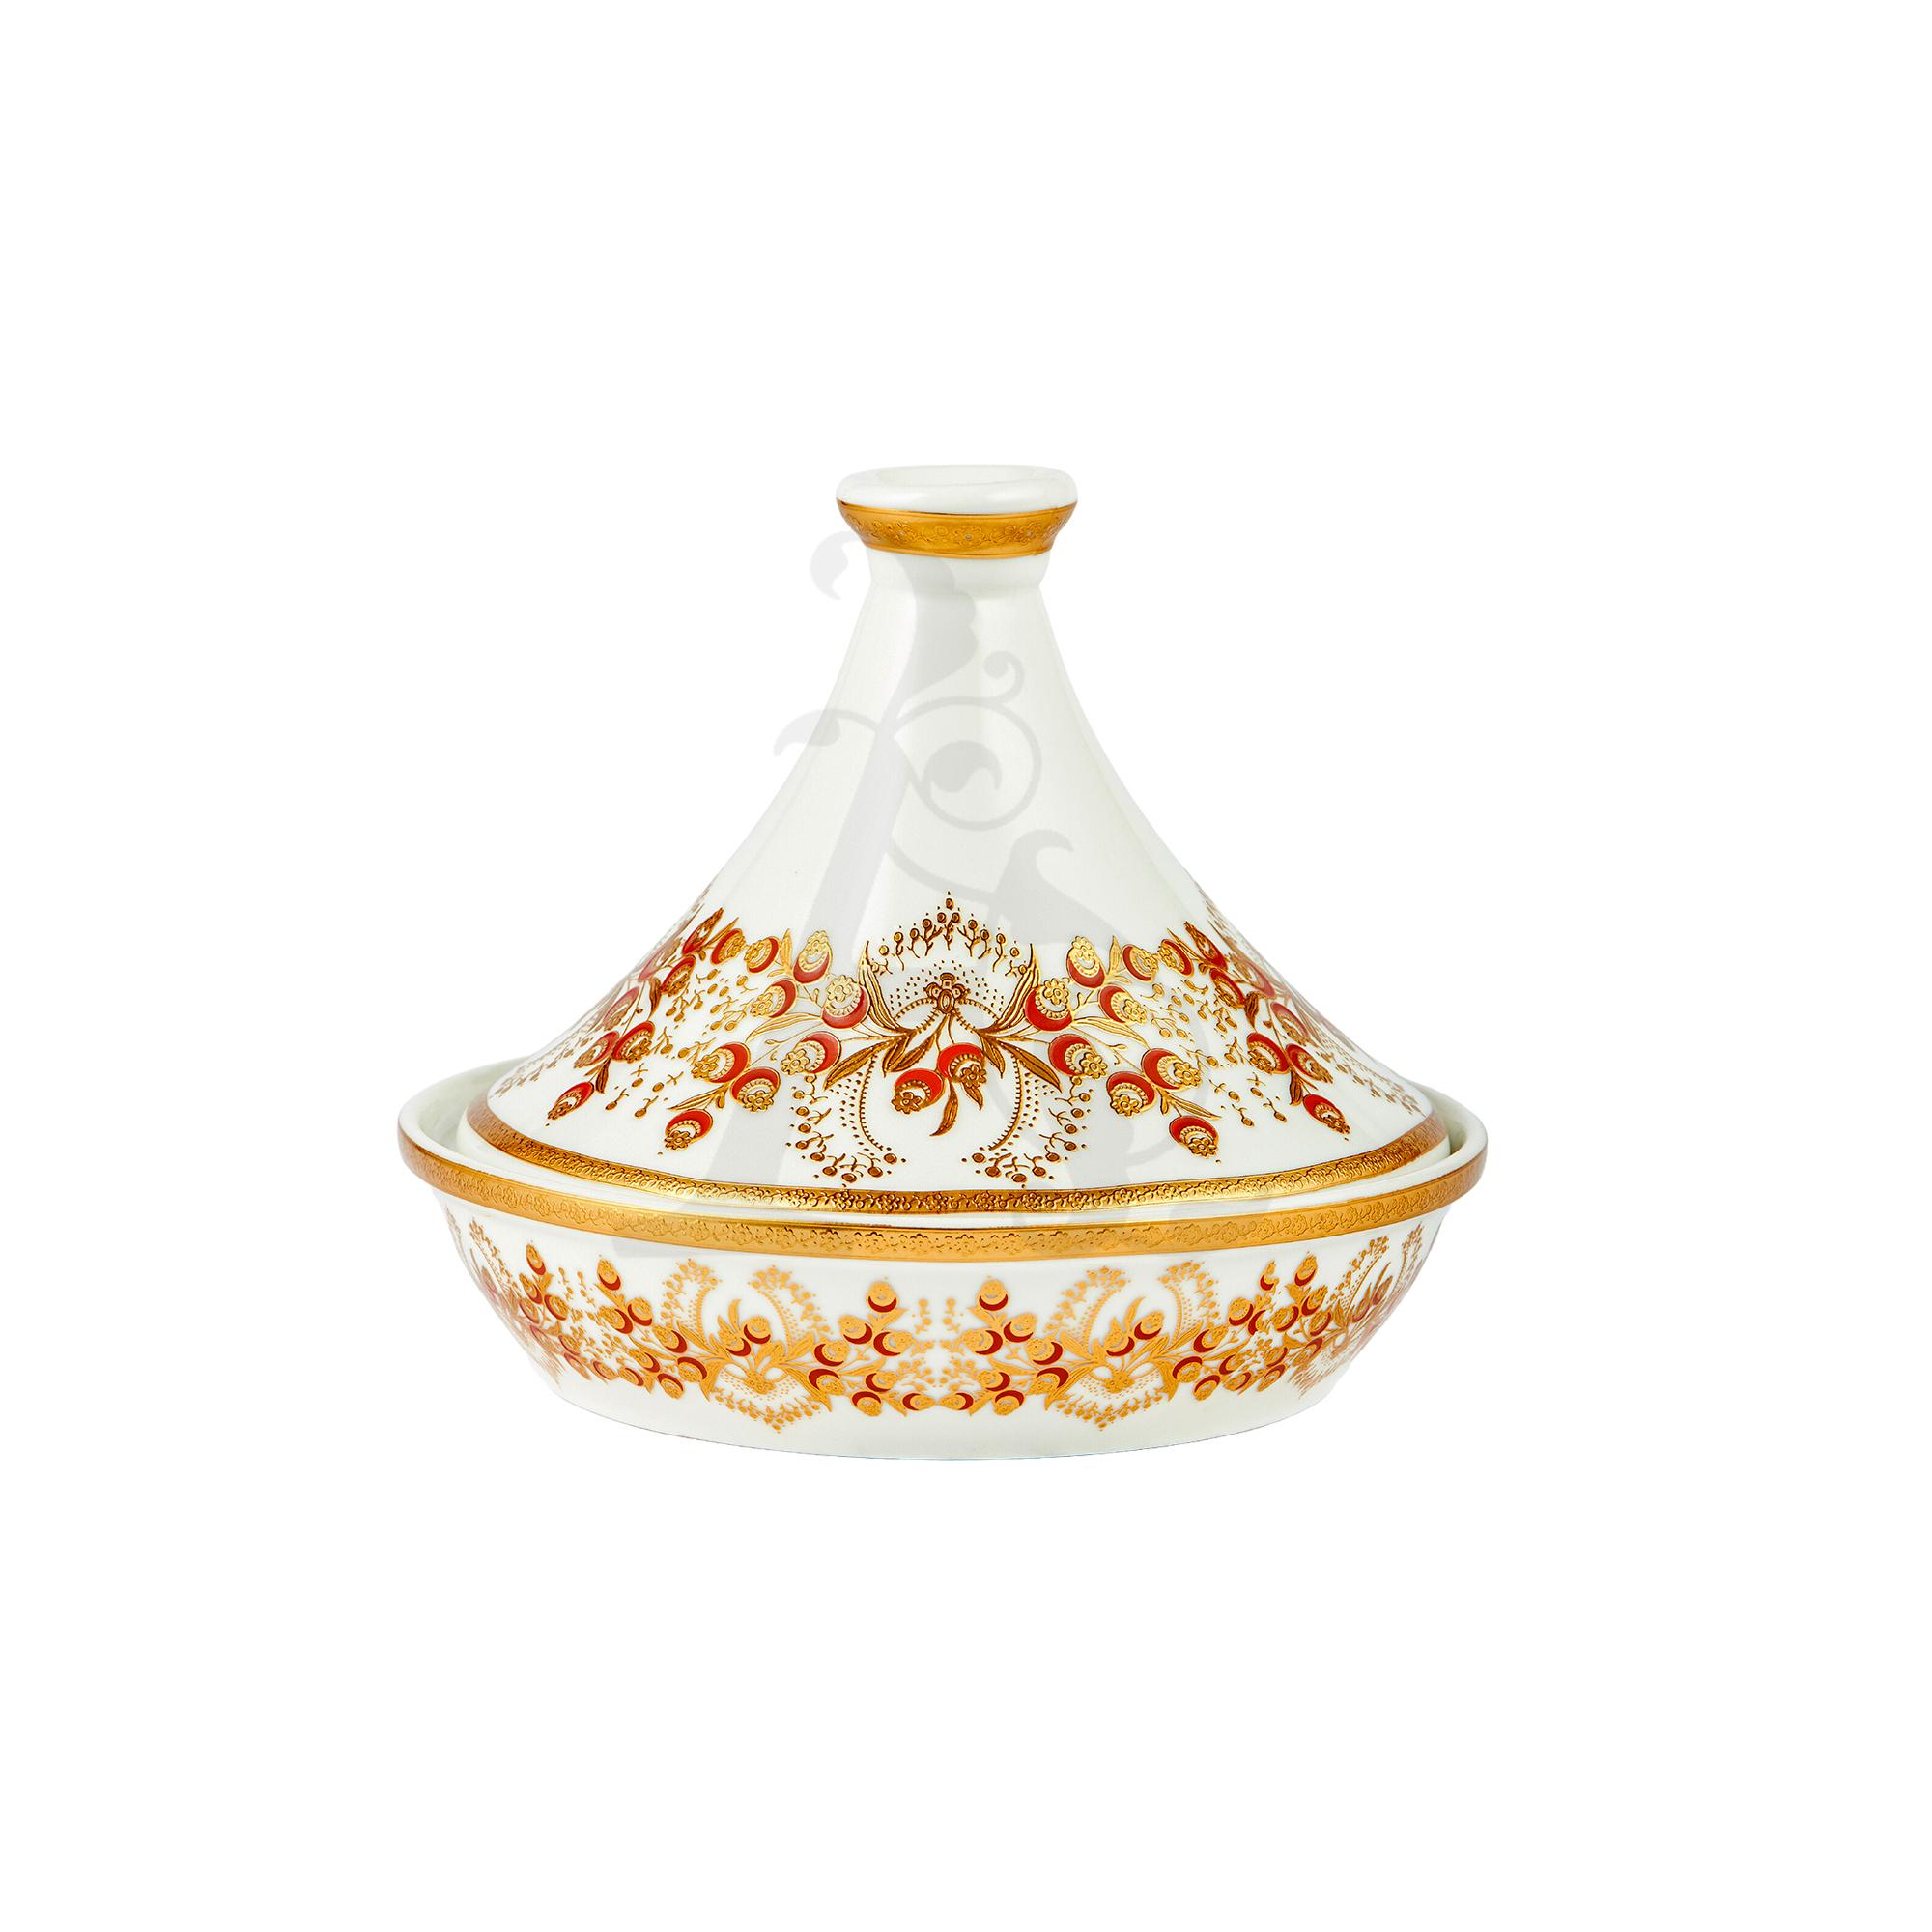 Buy Victoriana tajine dessert server with decal - Gold 3